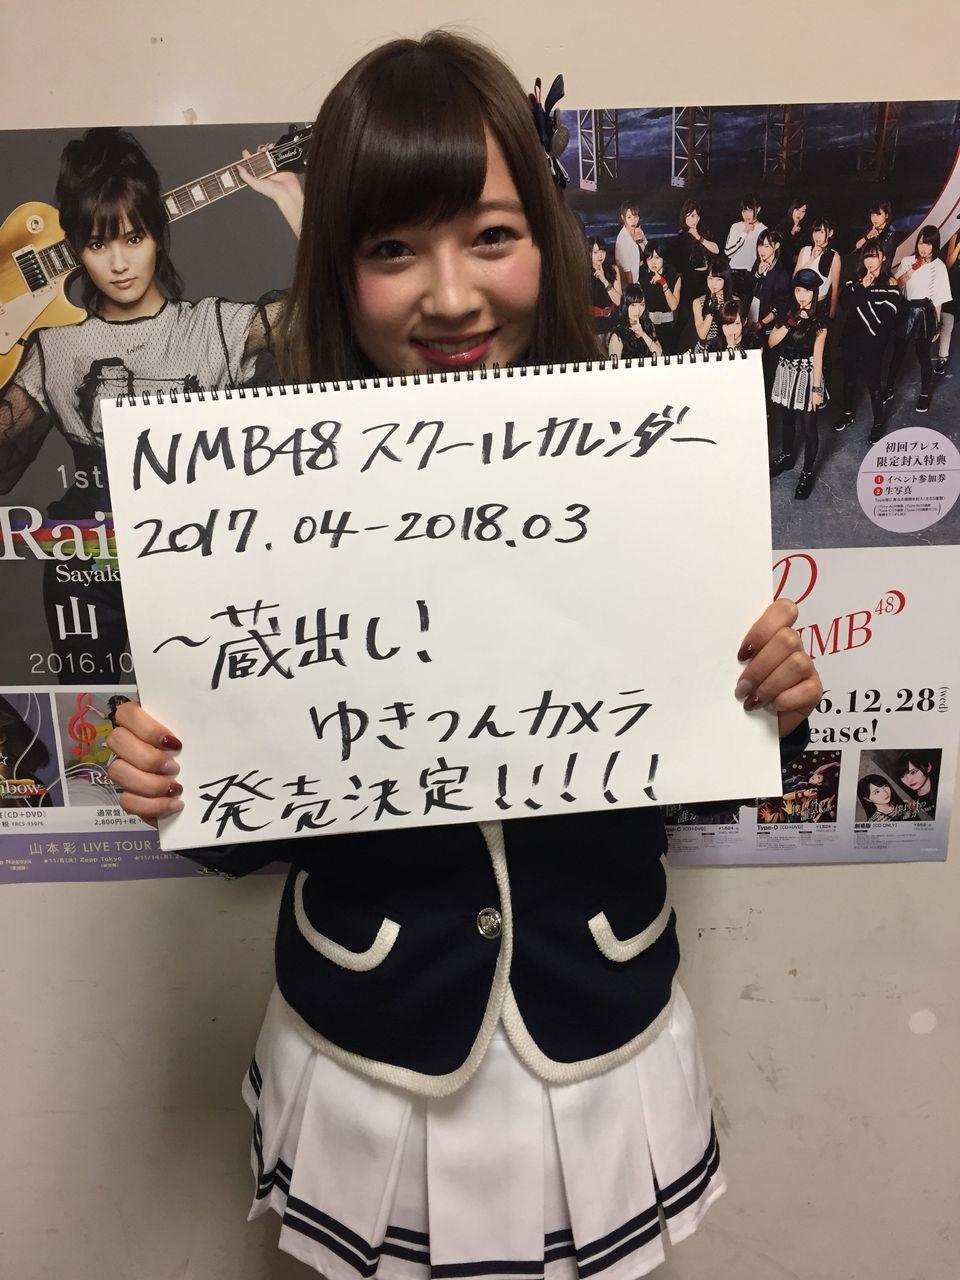 【SHOWROOM】ゆきつんカメラプレゼンツ「NMB48スクールカレンダー」発売決定キタ━━━━(゚∀゚)━━━━!!【明日より予約開始】